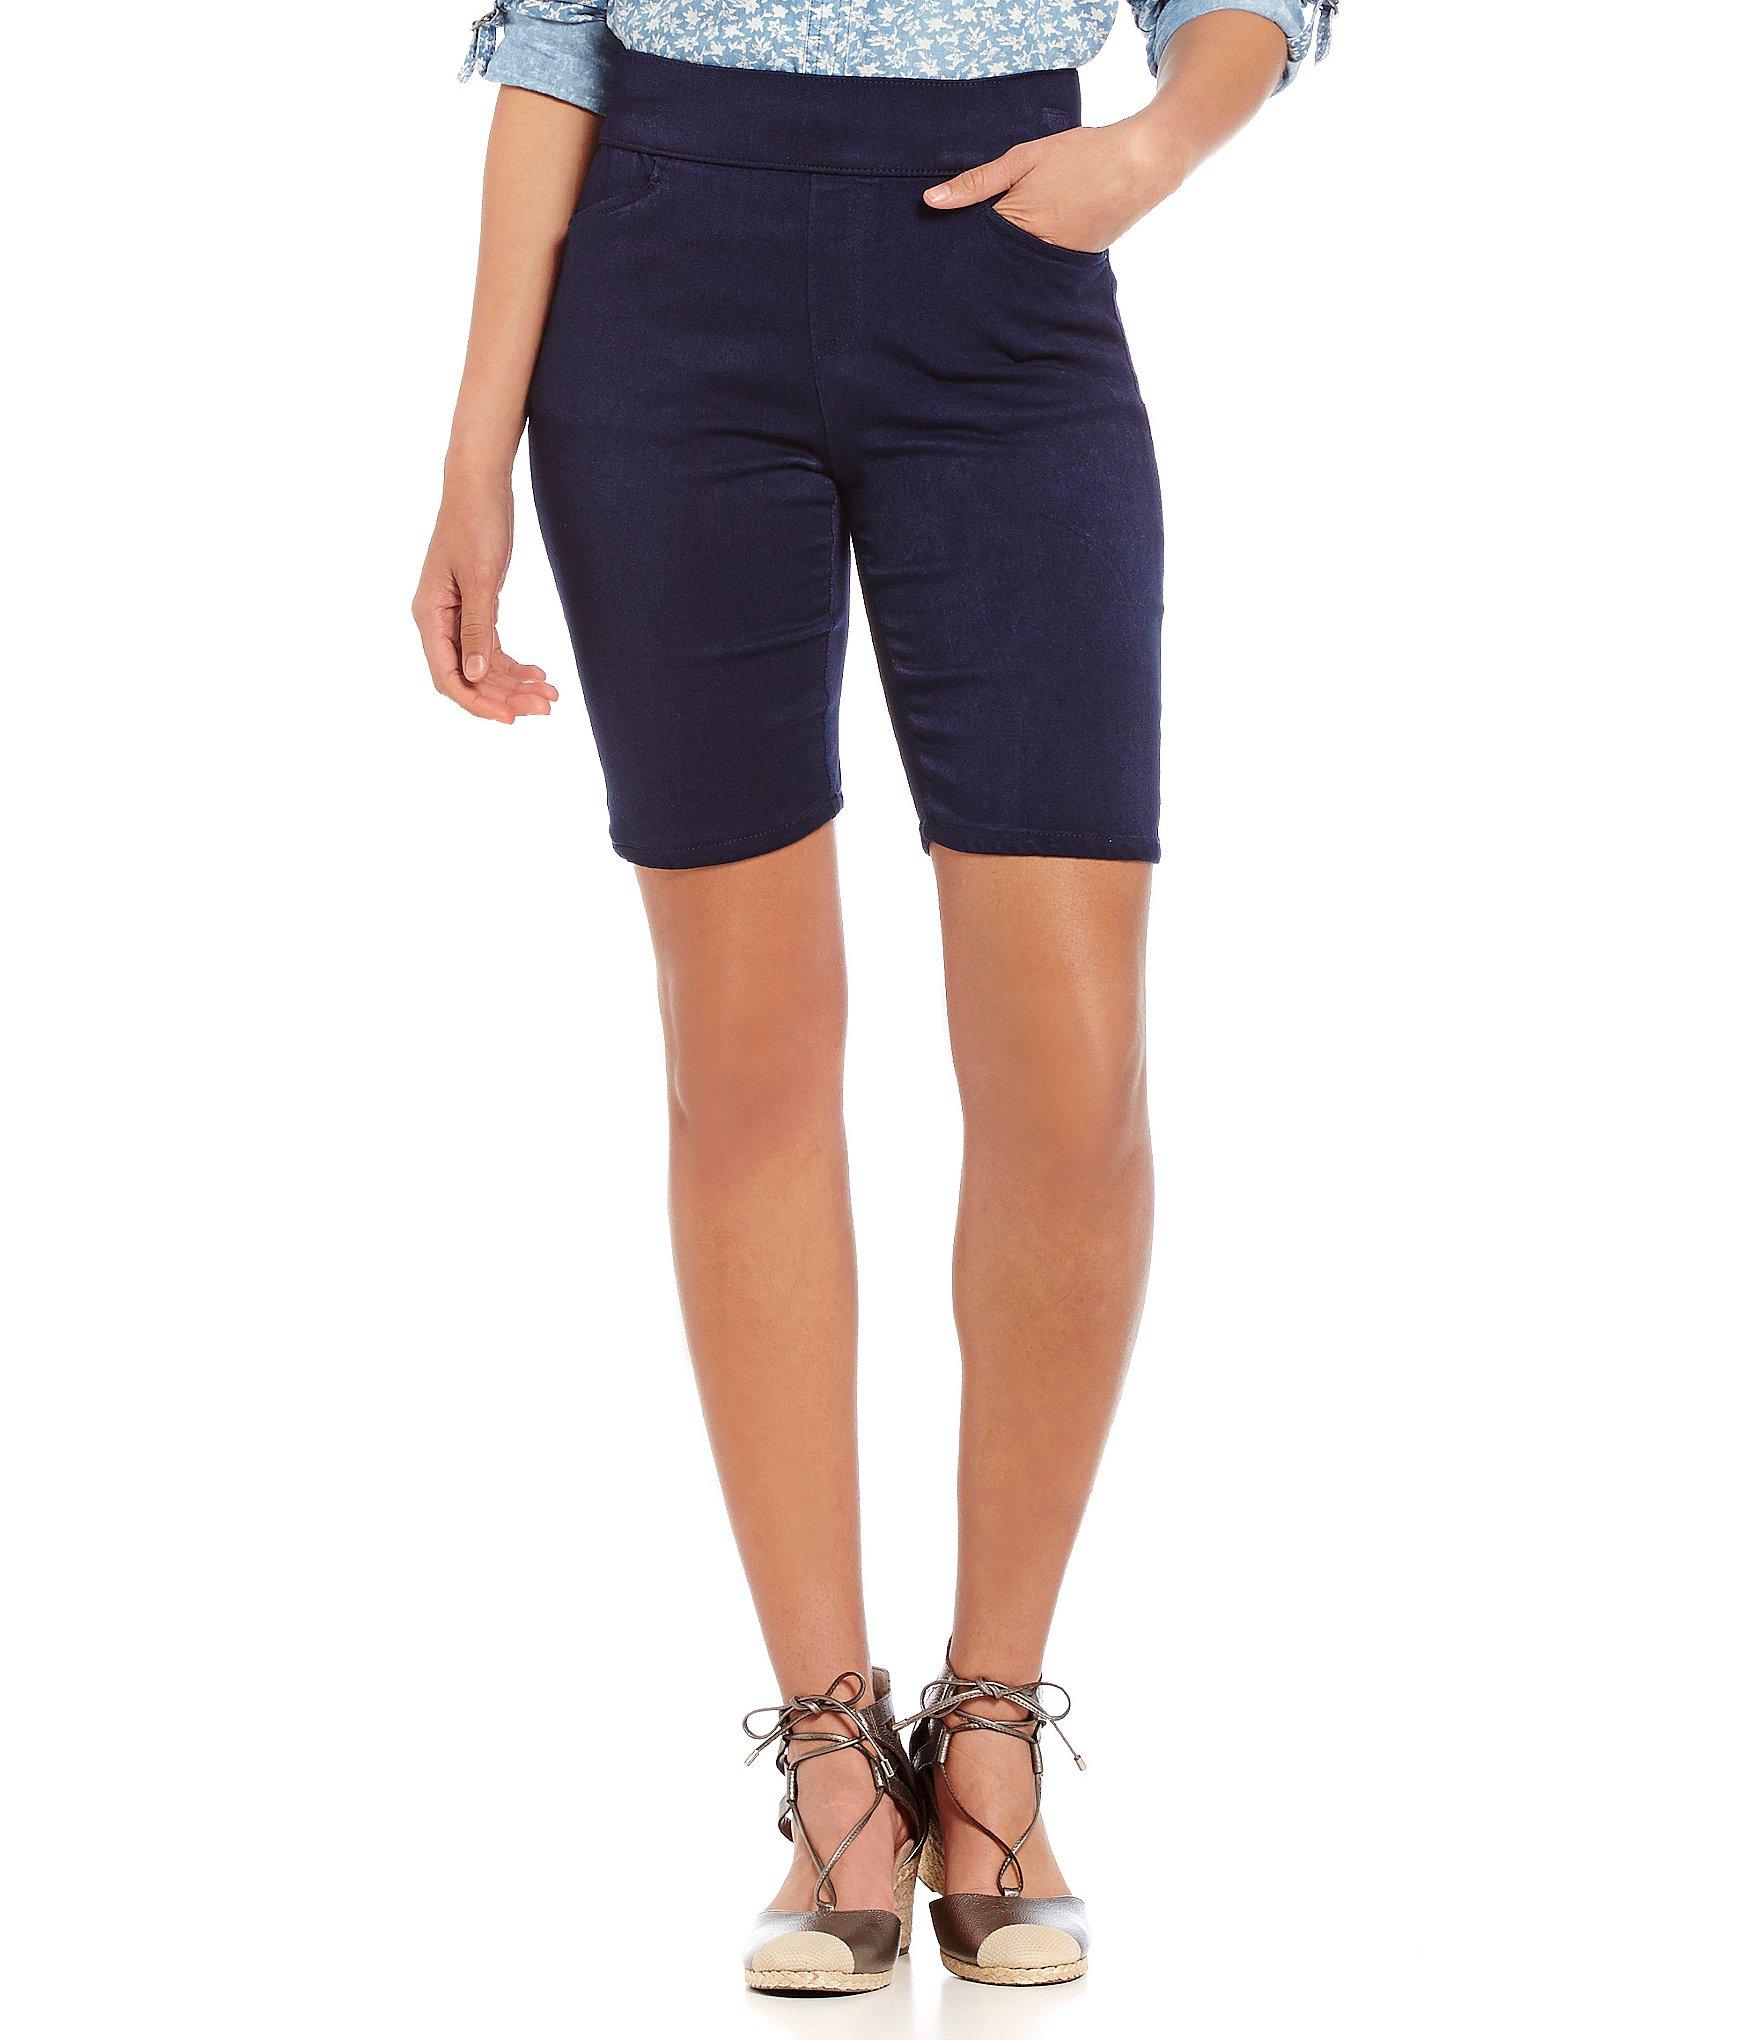 Stylish and Classical Womens Bermuda Shorts